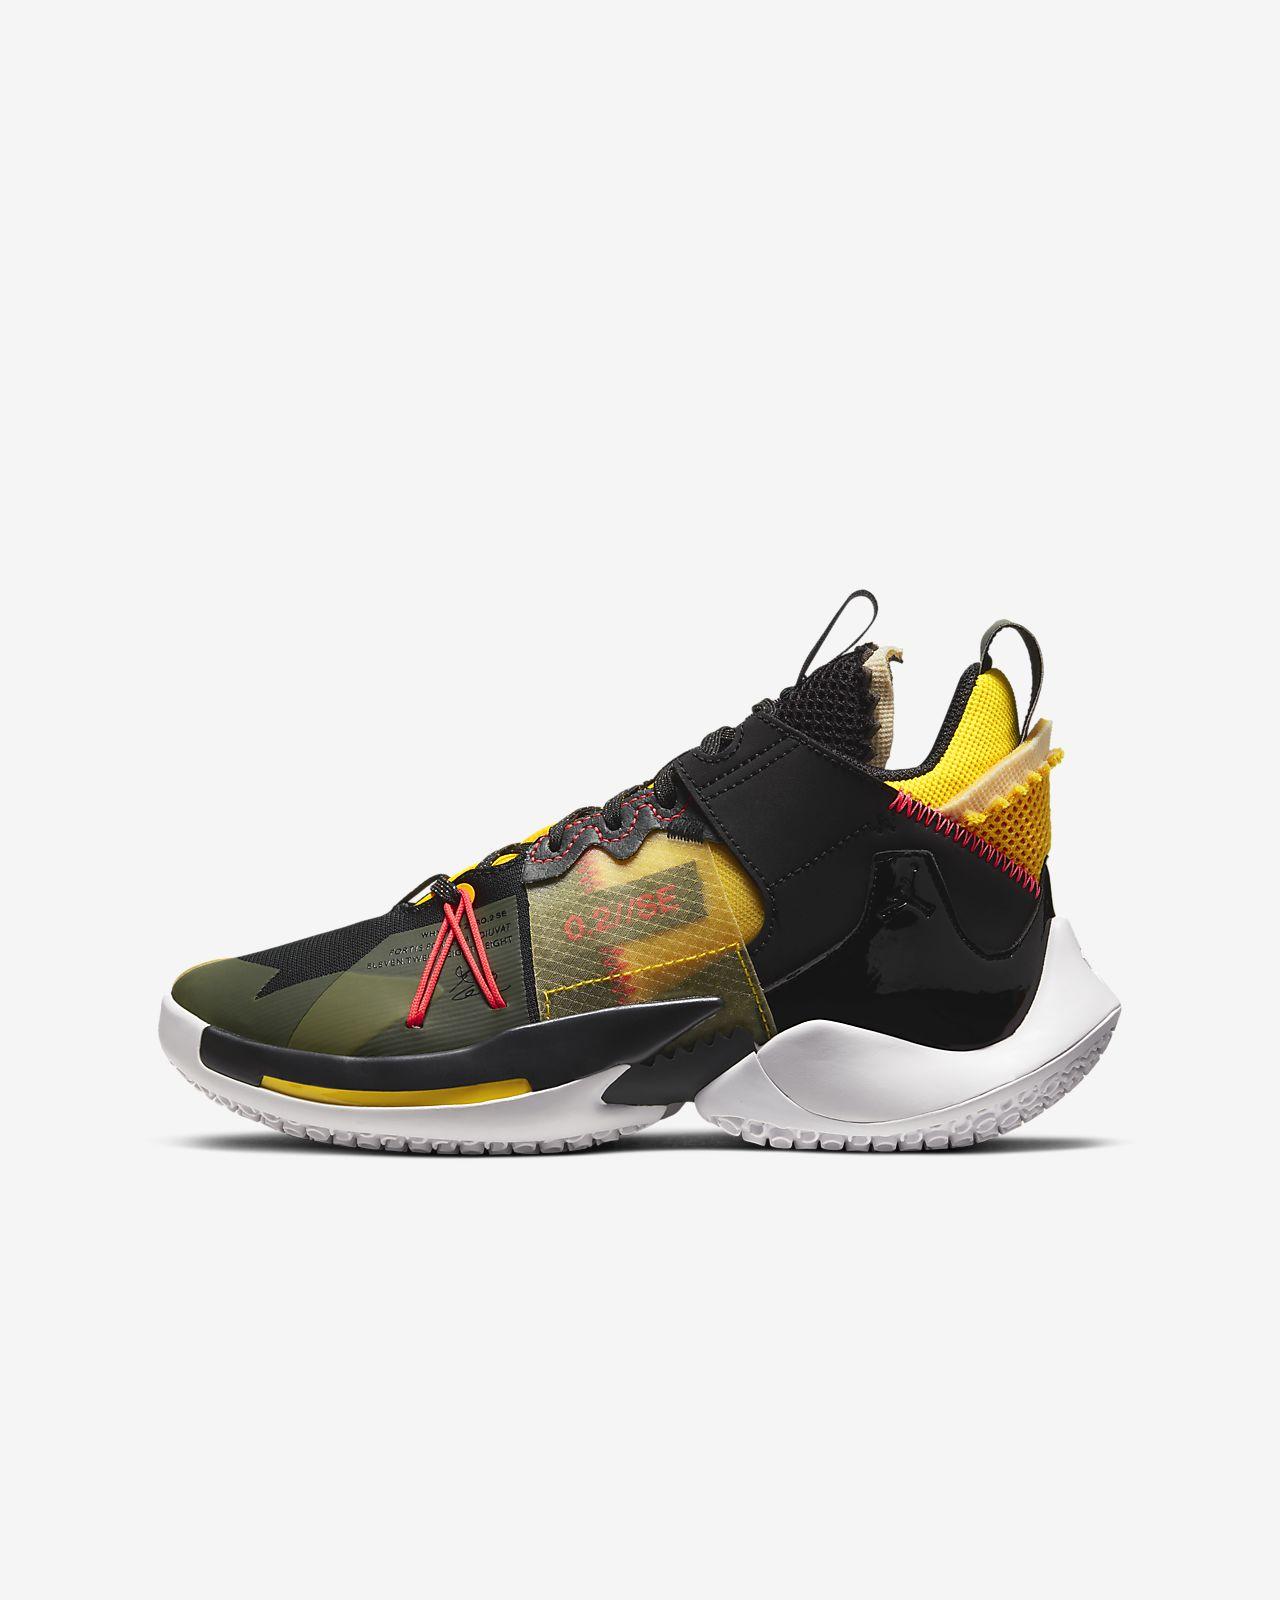 Jordan 'Why Not?' Zer0.2 SE Older Kids' Basketball Shoe